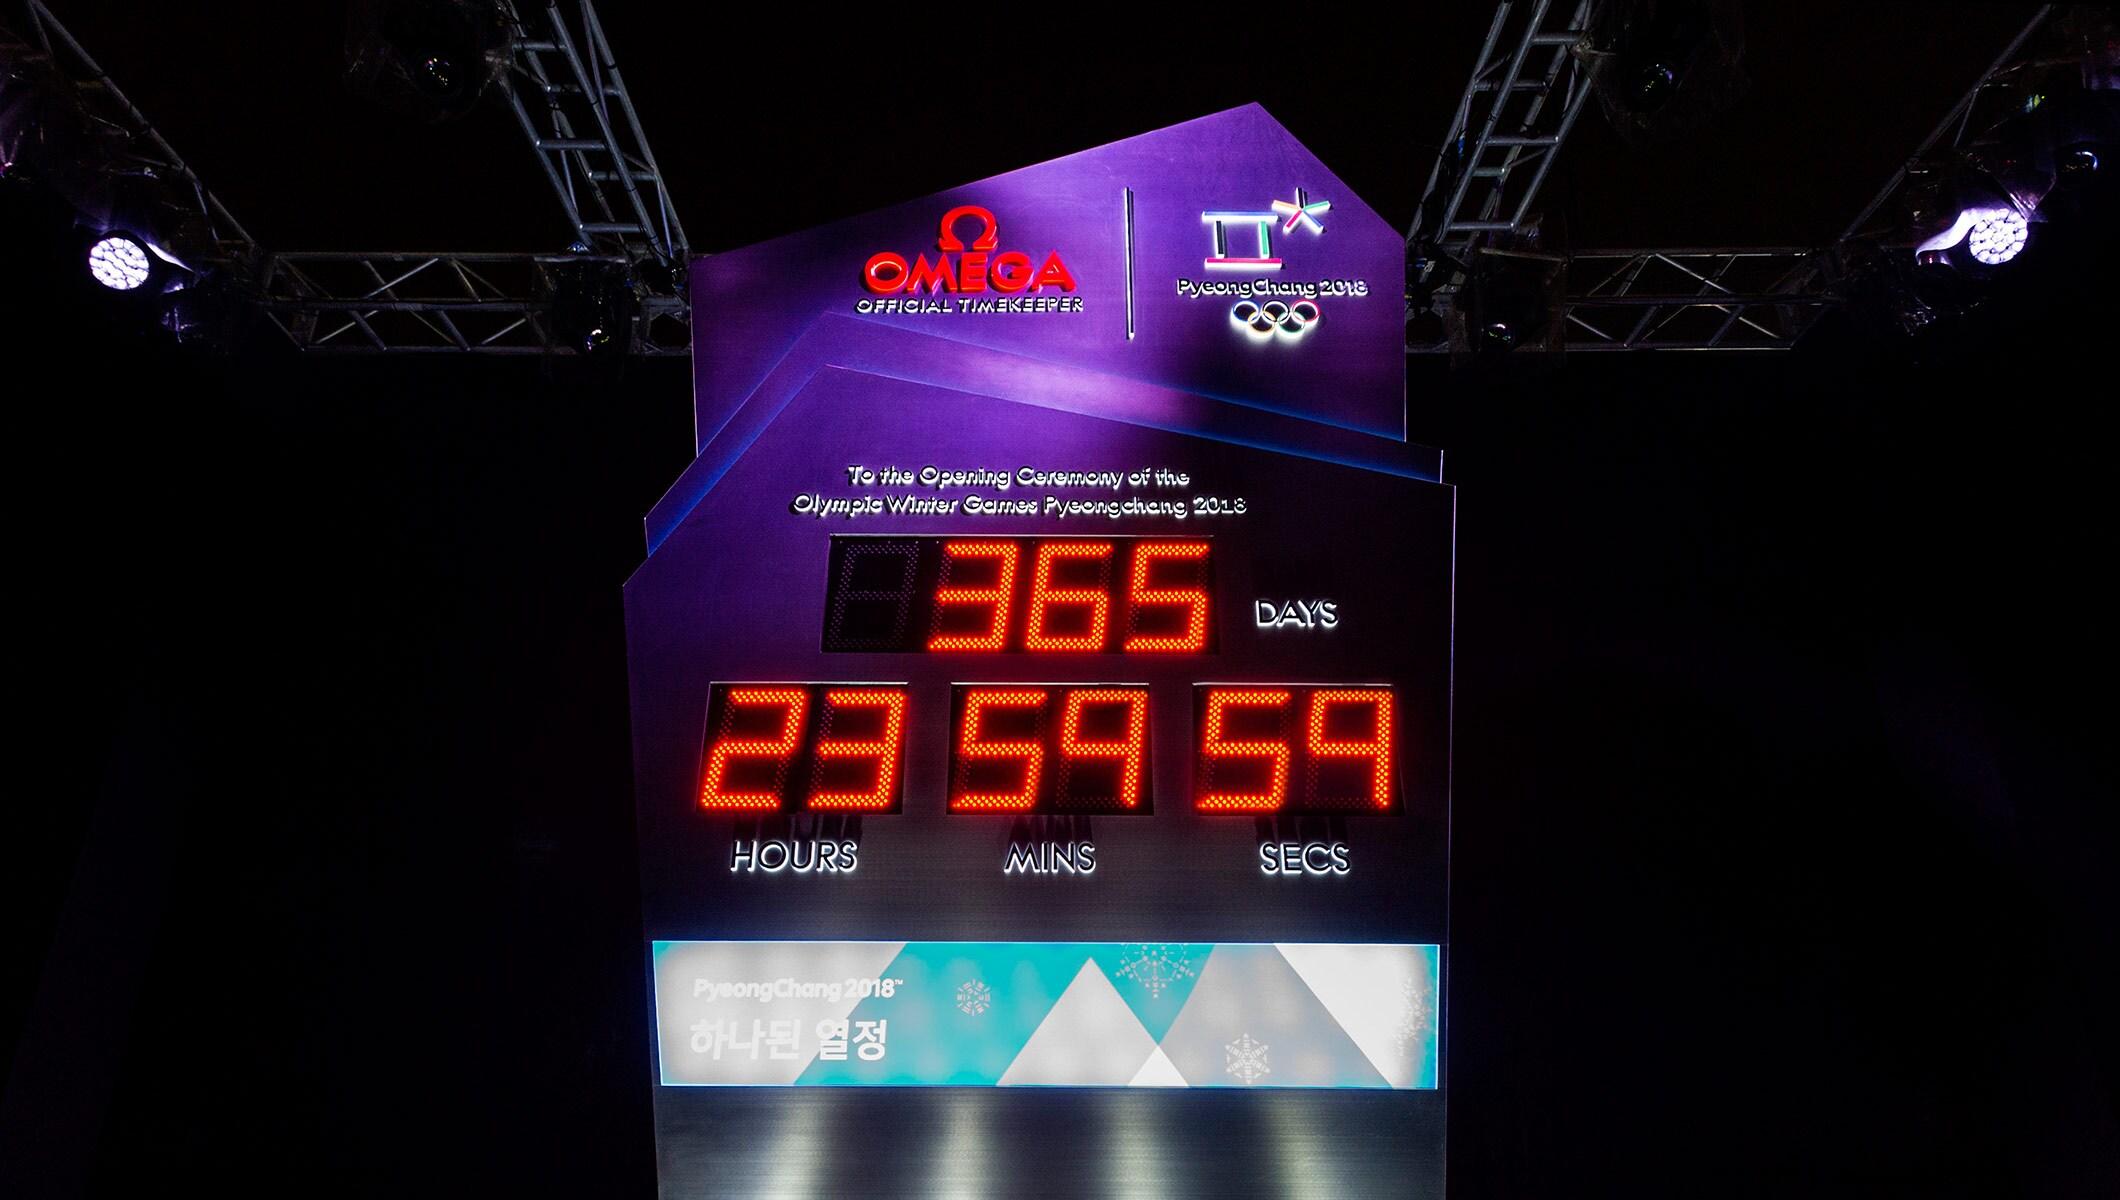 PyeongChang 2018 Countdown Clock